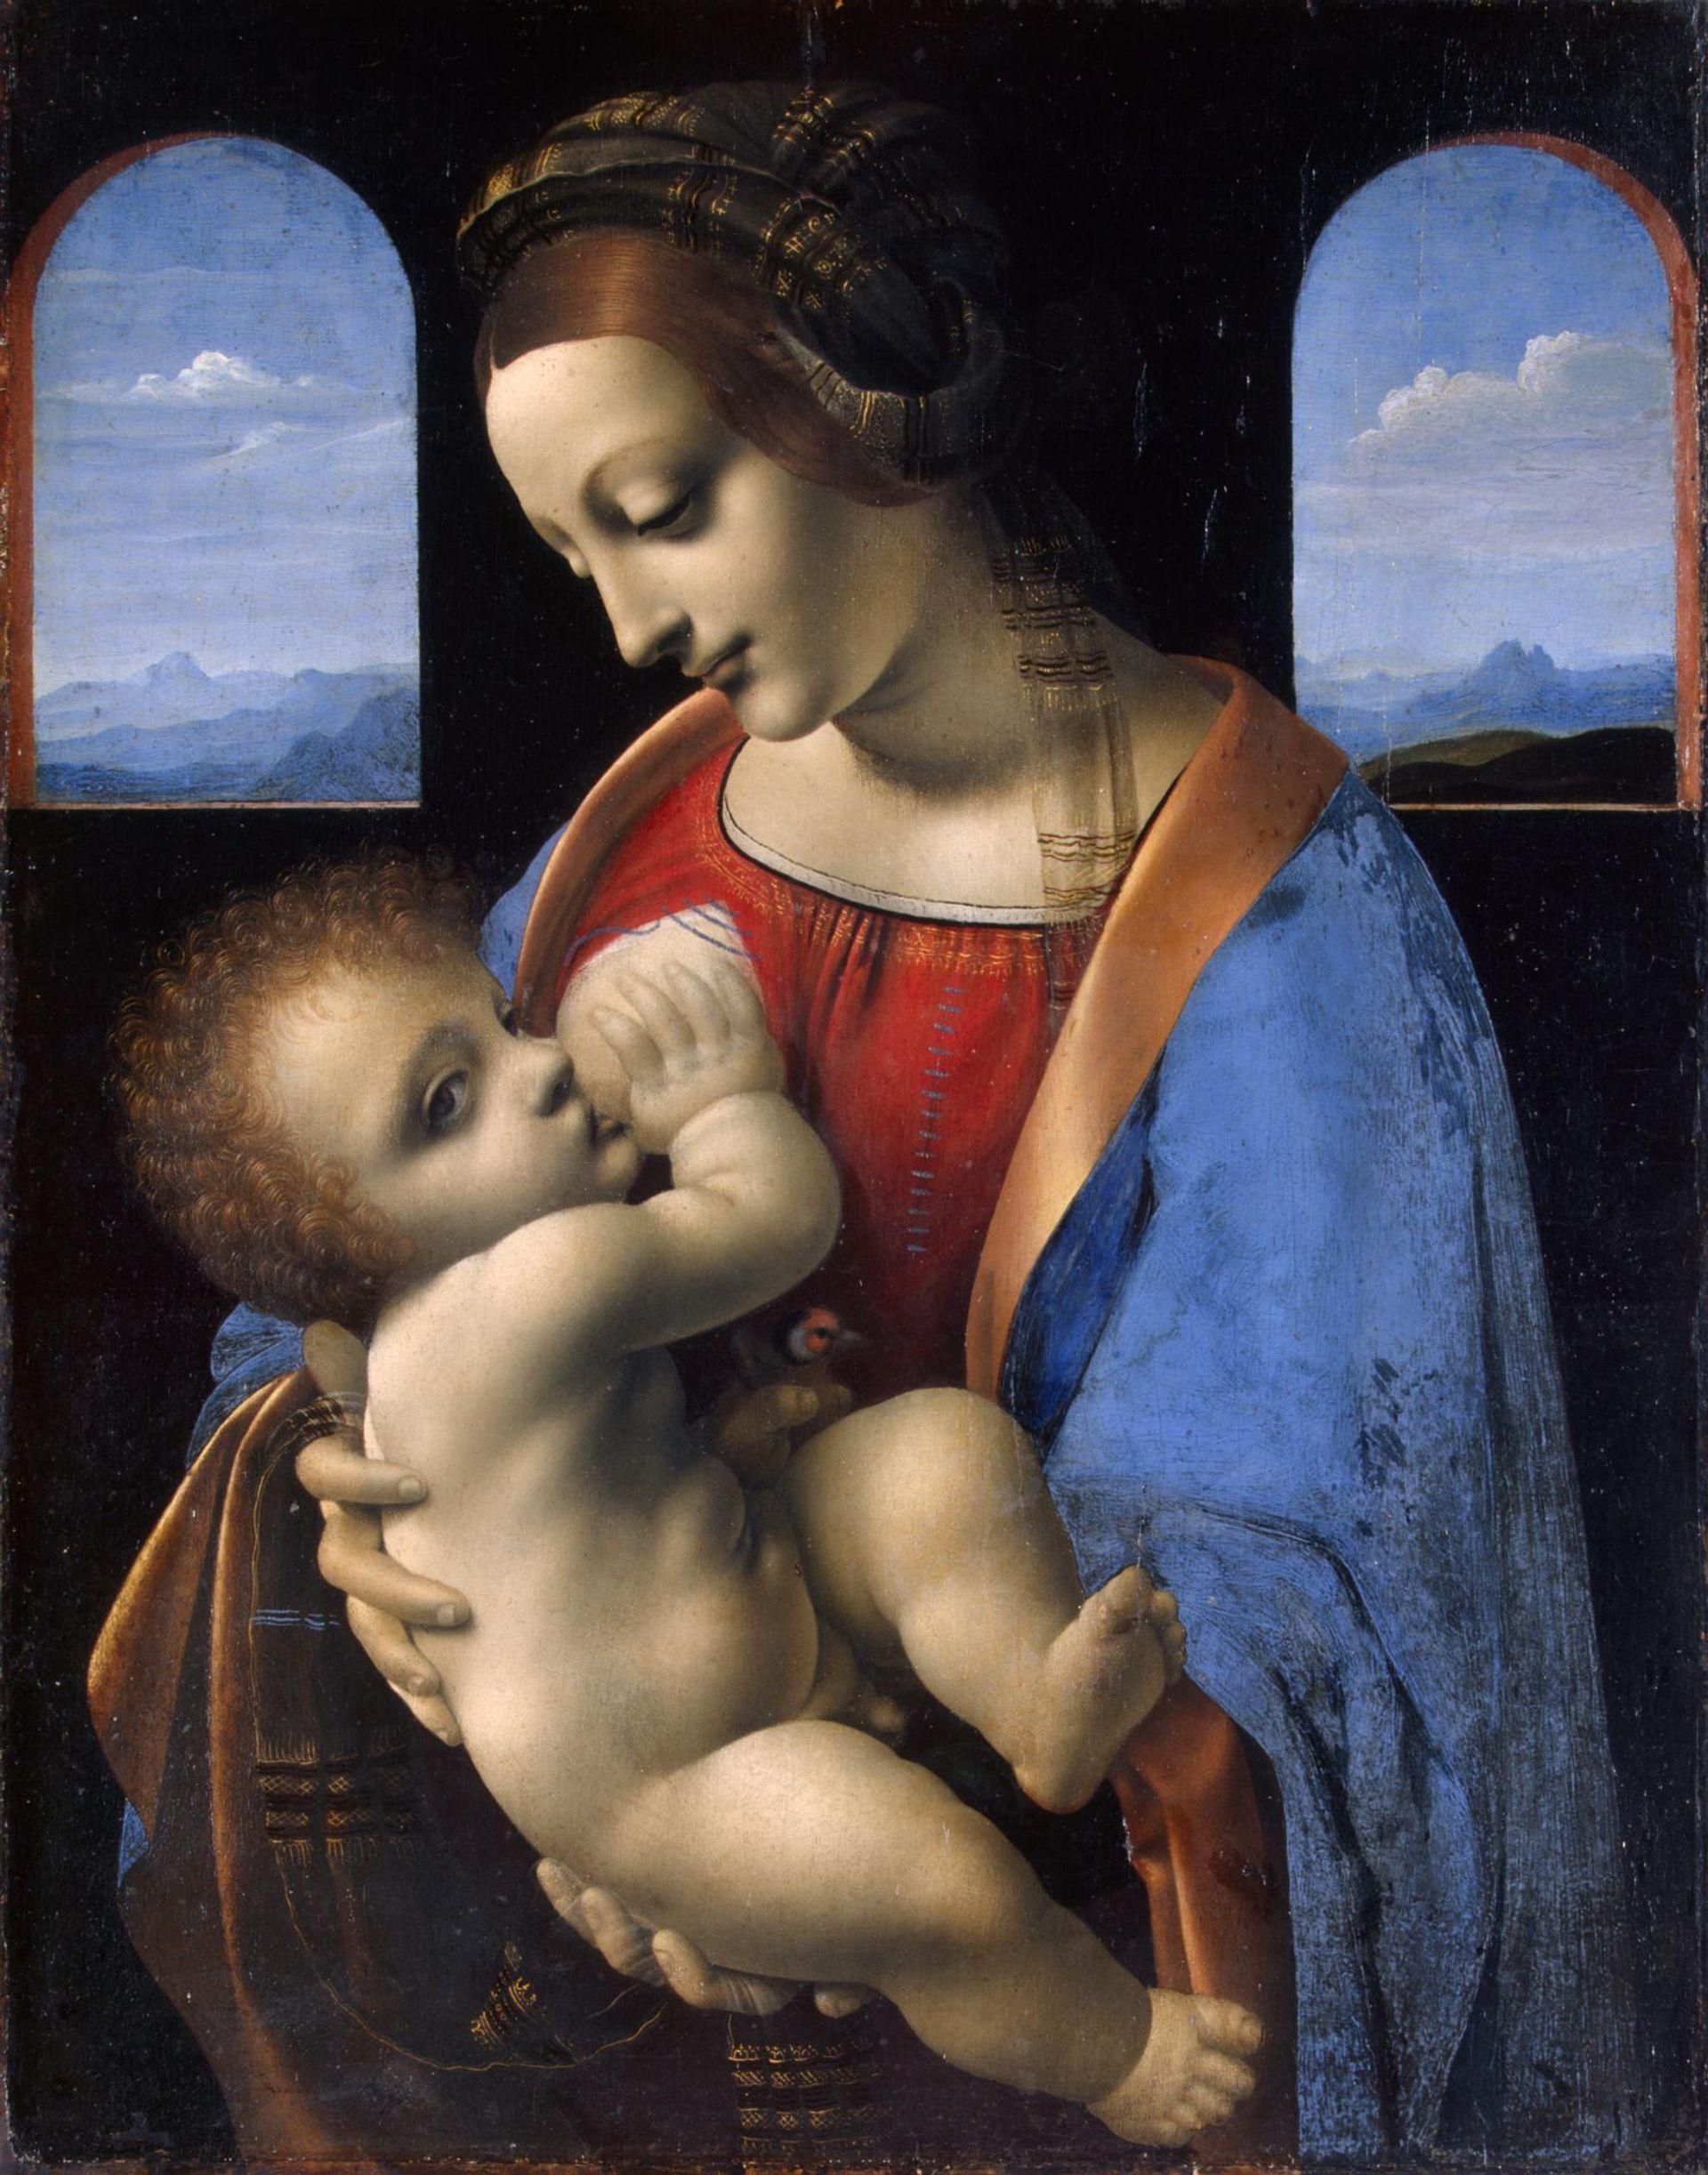 Leonardo da Vinci's Madonna Litta (1490) in the State Hermitage Museum will be turned into an NFT